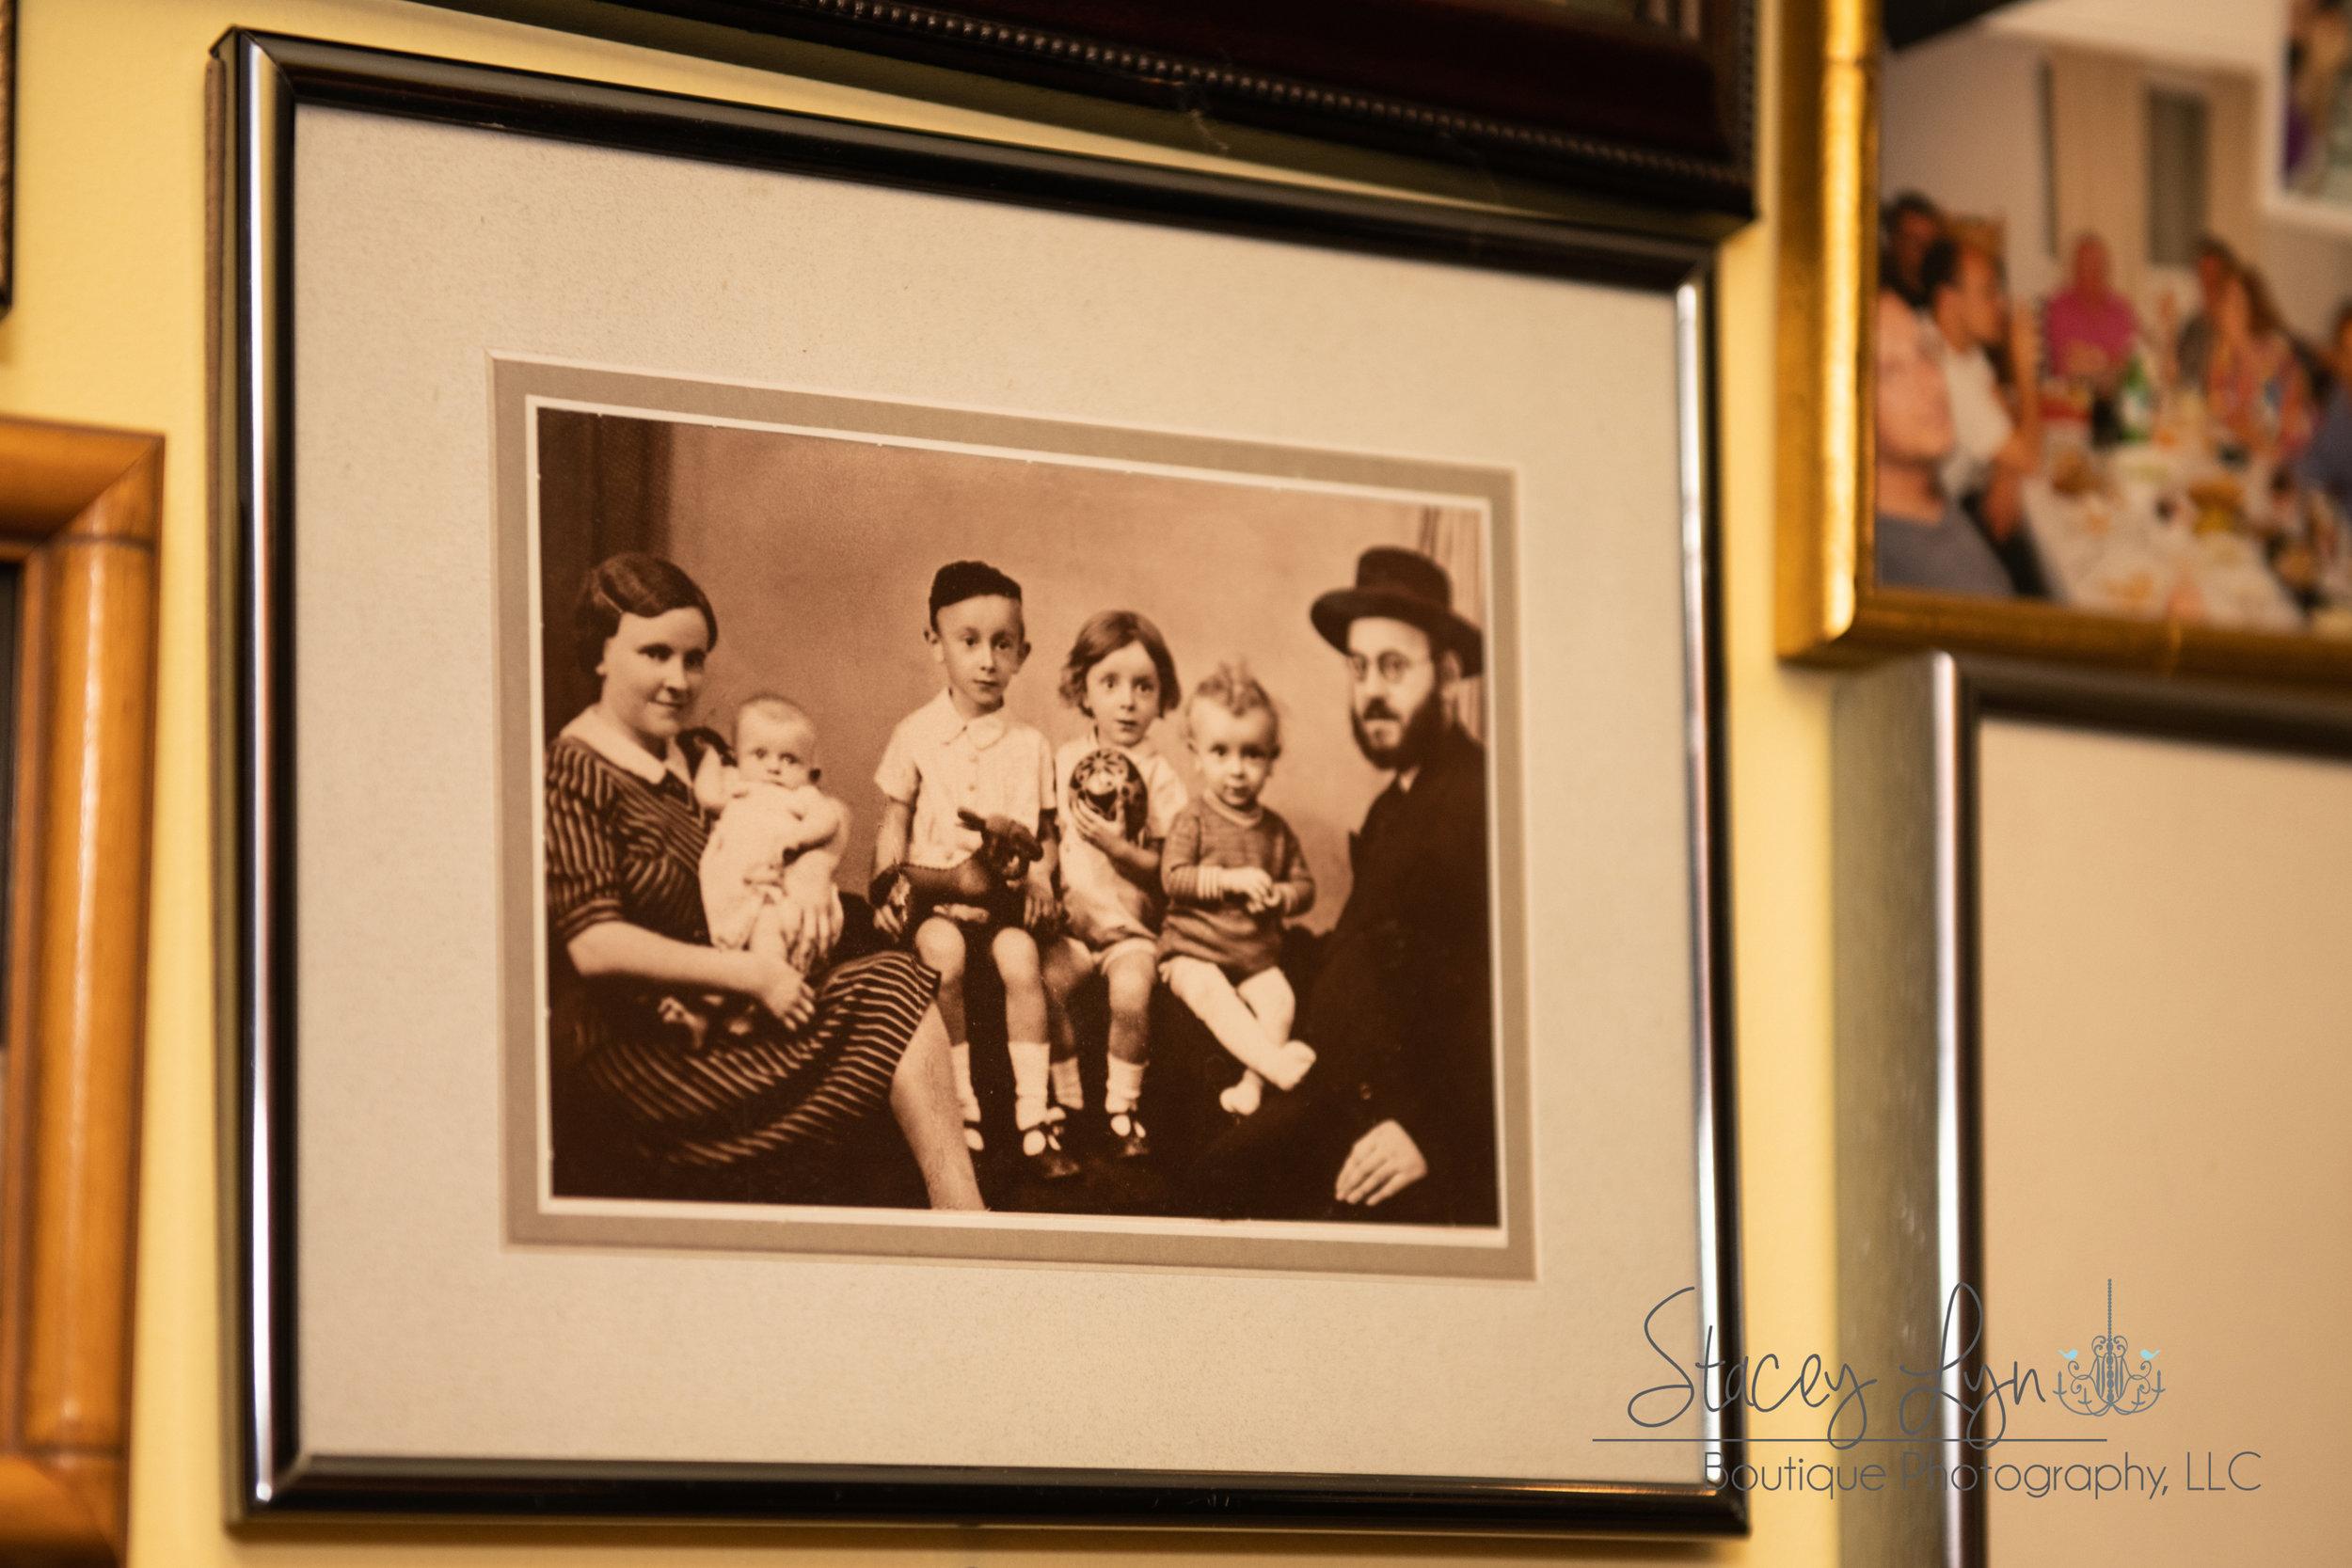 Judah Samet's family before the Holocaust. (Judah, second from right)